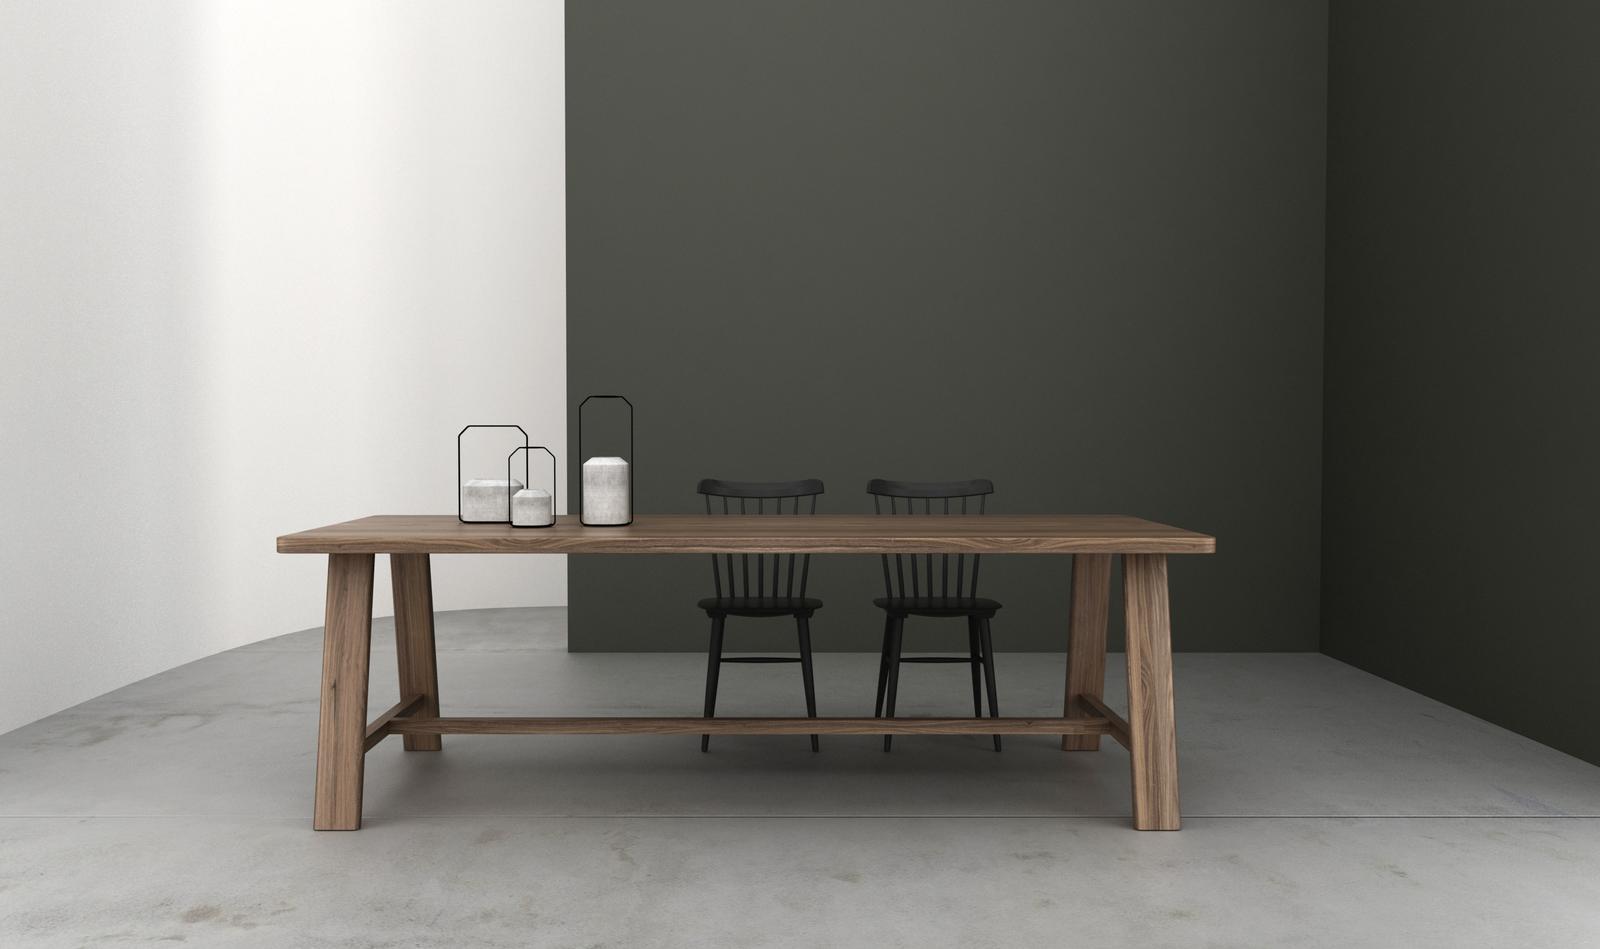 Jedálenský stôl FARM by Cubica - Jedálenský stôl FARM by Cubica